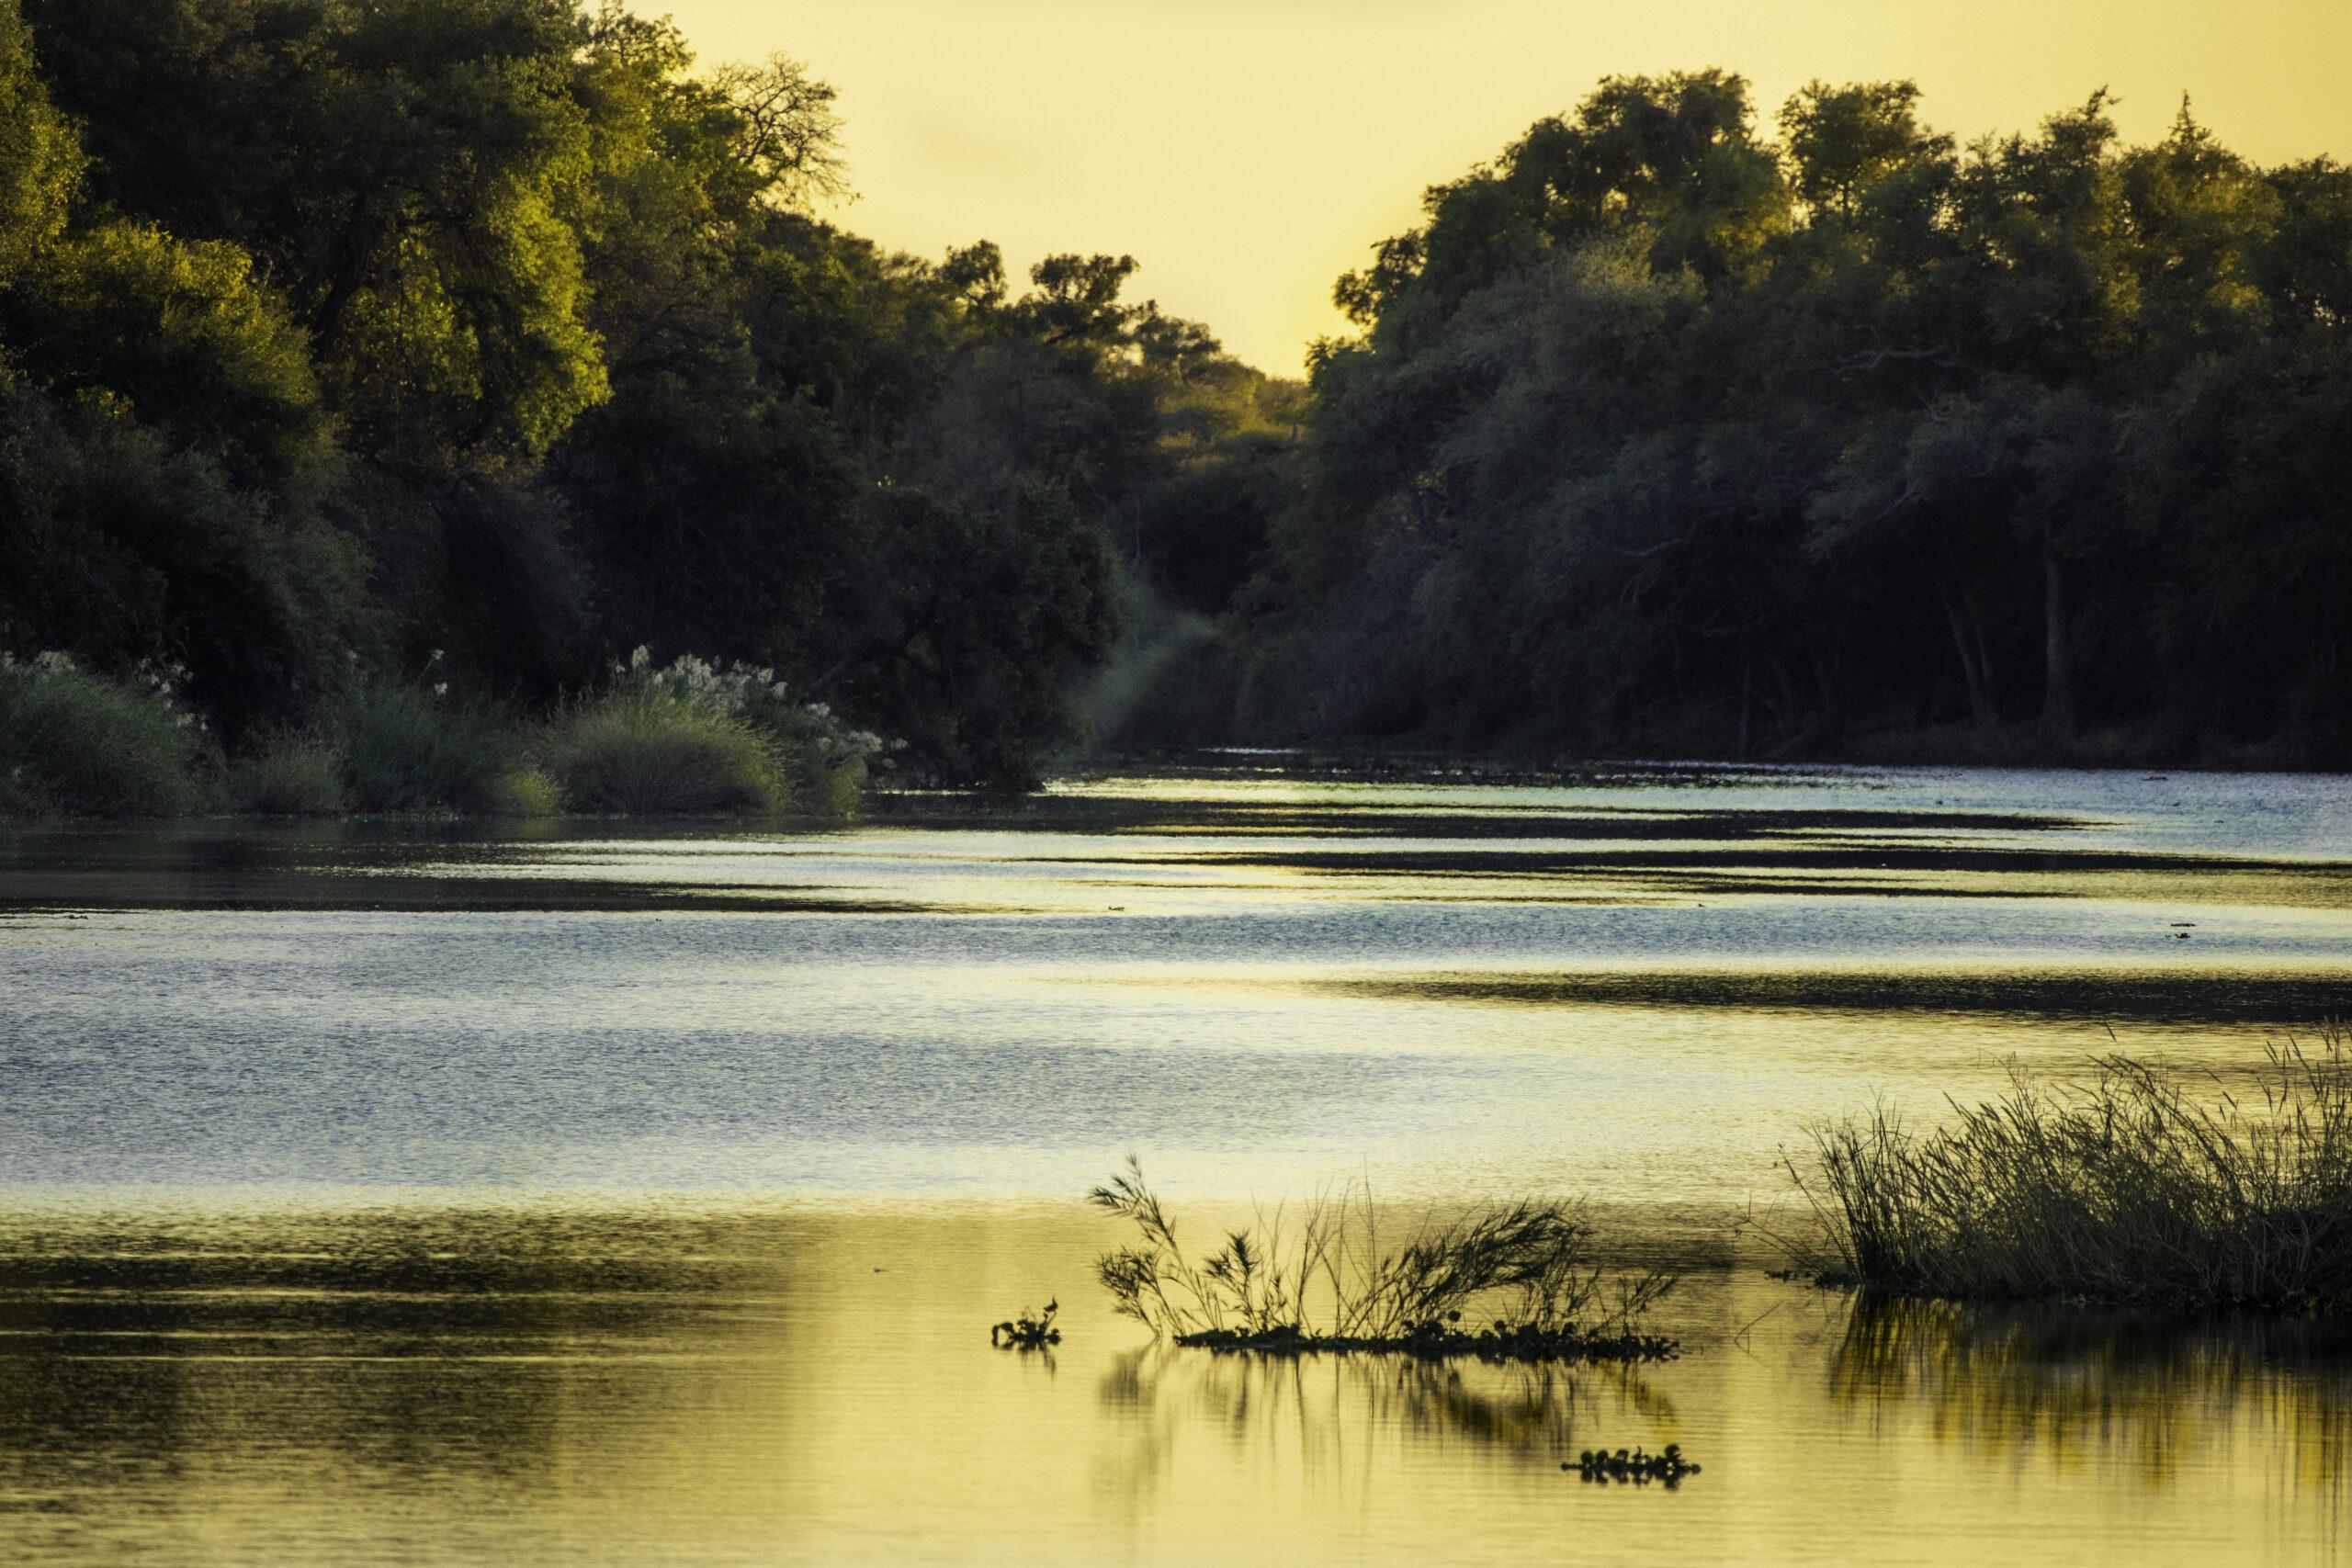 Sunrise over the Limpopo river